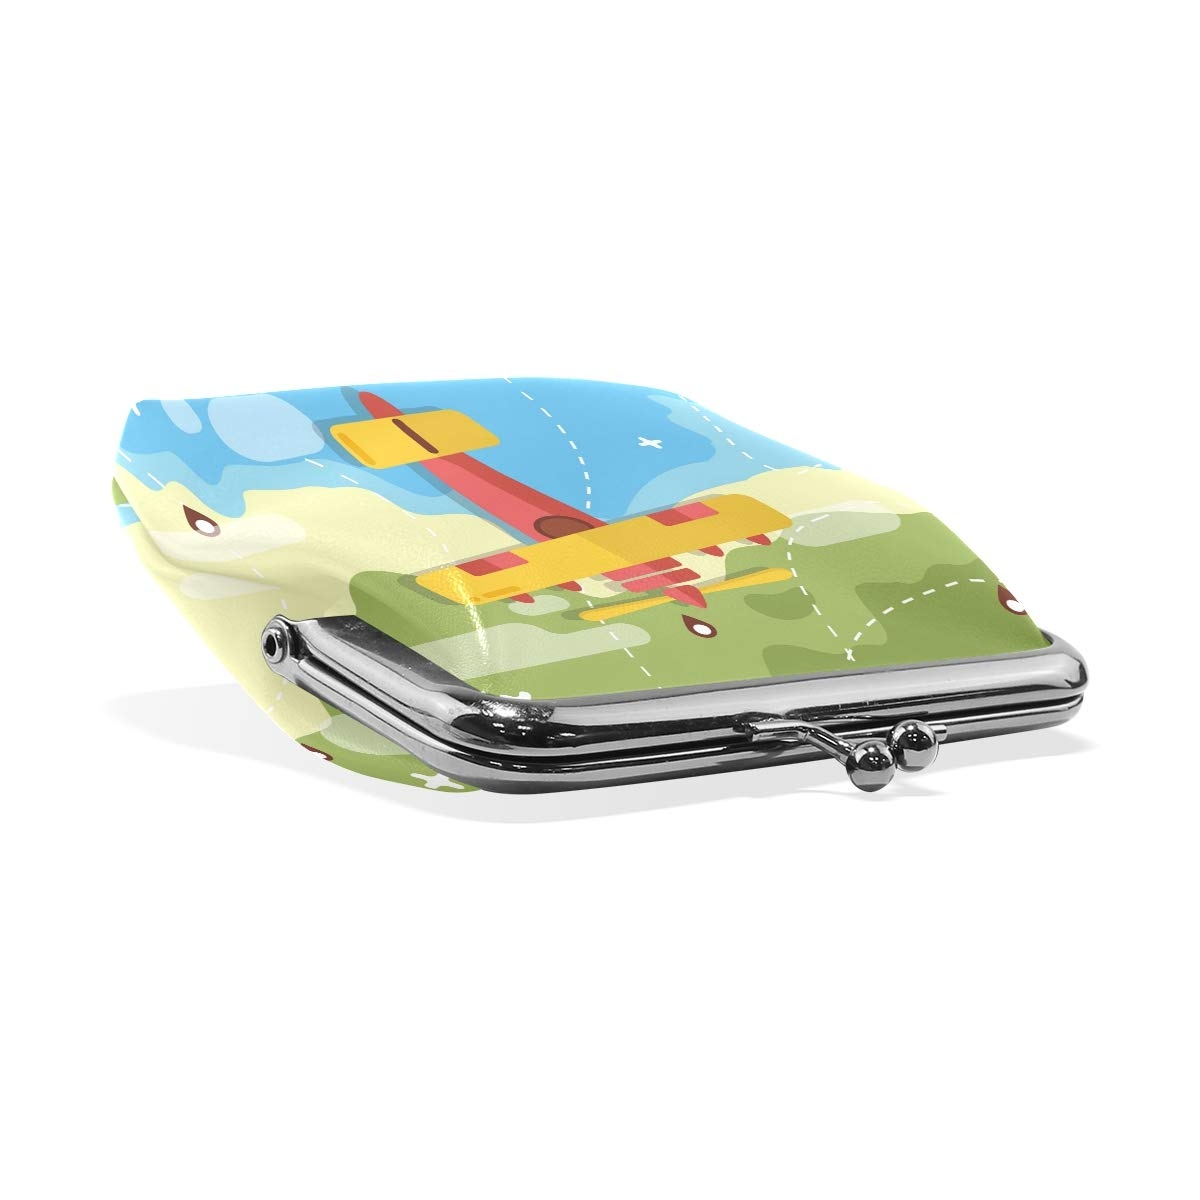 LALATOP Biplane Womens Coin Pouch Purse wallet Card Holder Clutch Handbag